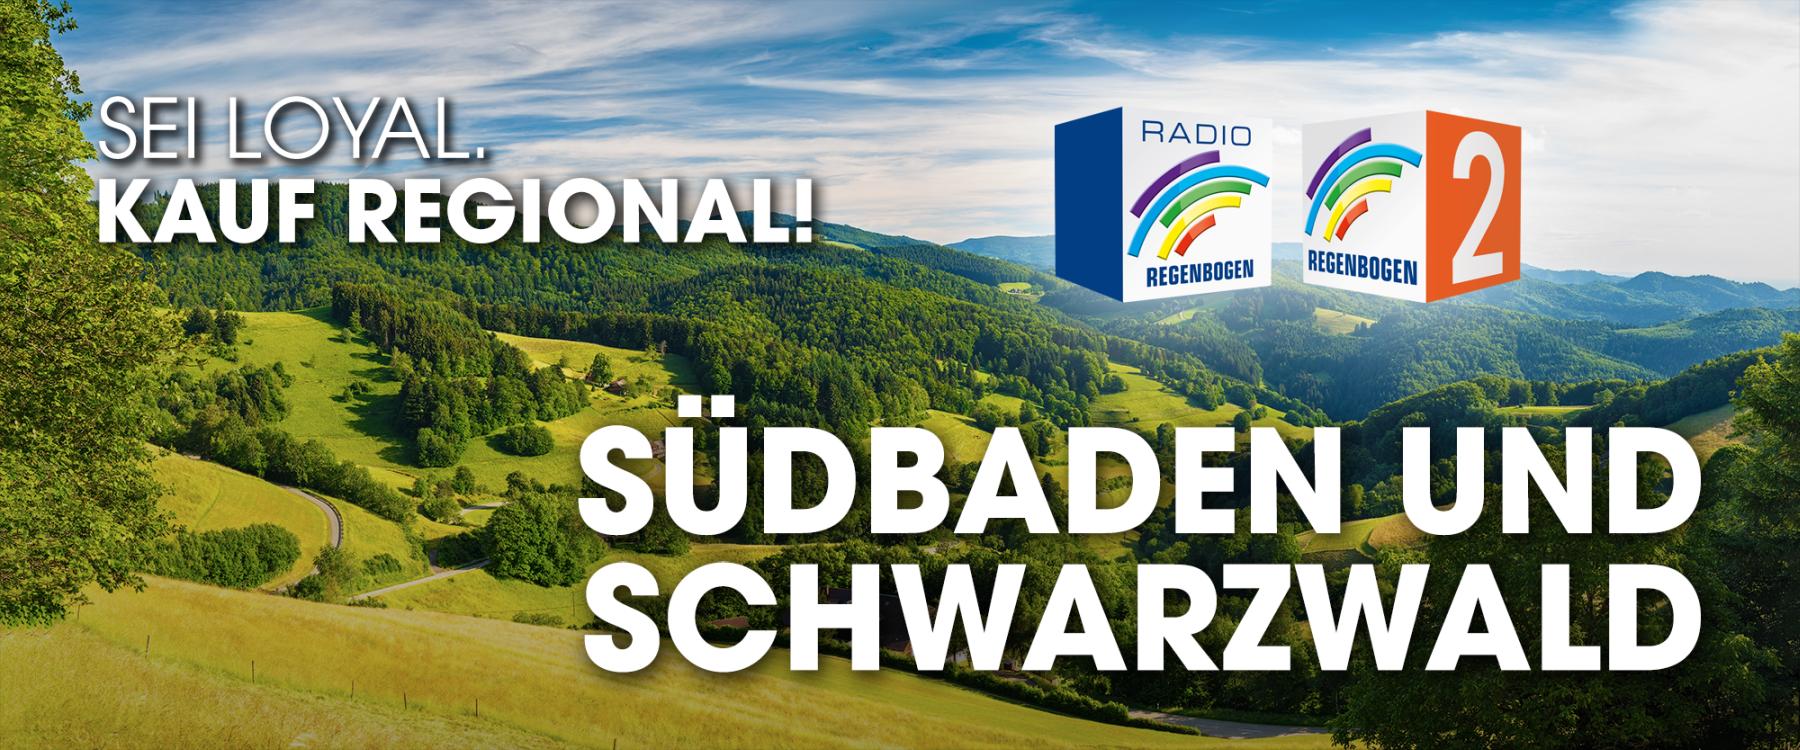 Kauf-regional-Titel-SuedbadenSchwarzwald.png